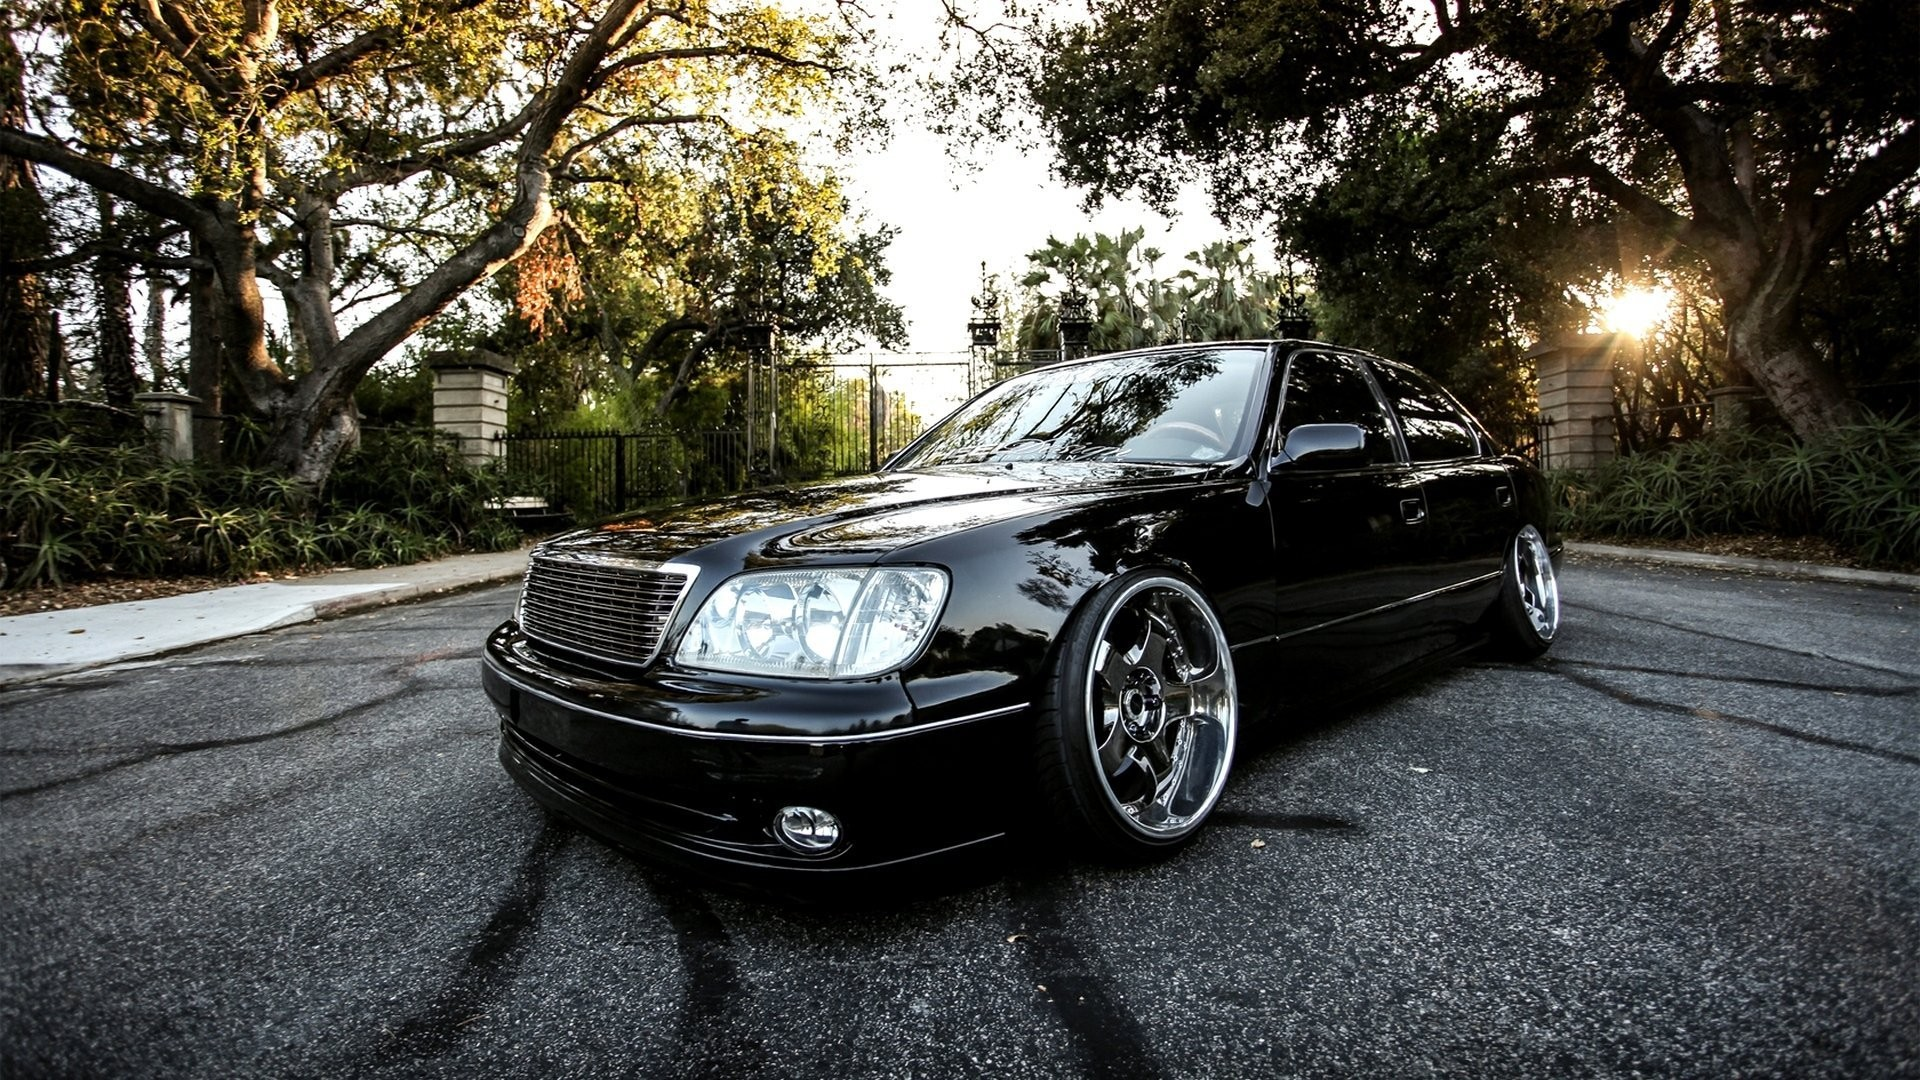 Car Wallpapers Black Vip Stance Luxury Lexus Ls400 Lexus Ls400 1920x1080 Download Hd Wallpaper Wallpapertip